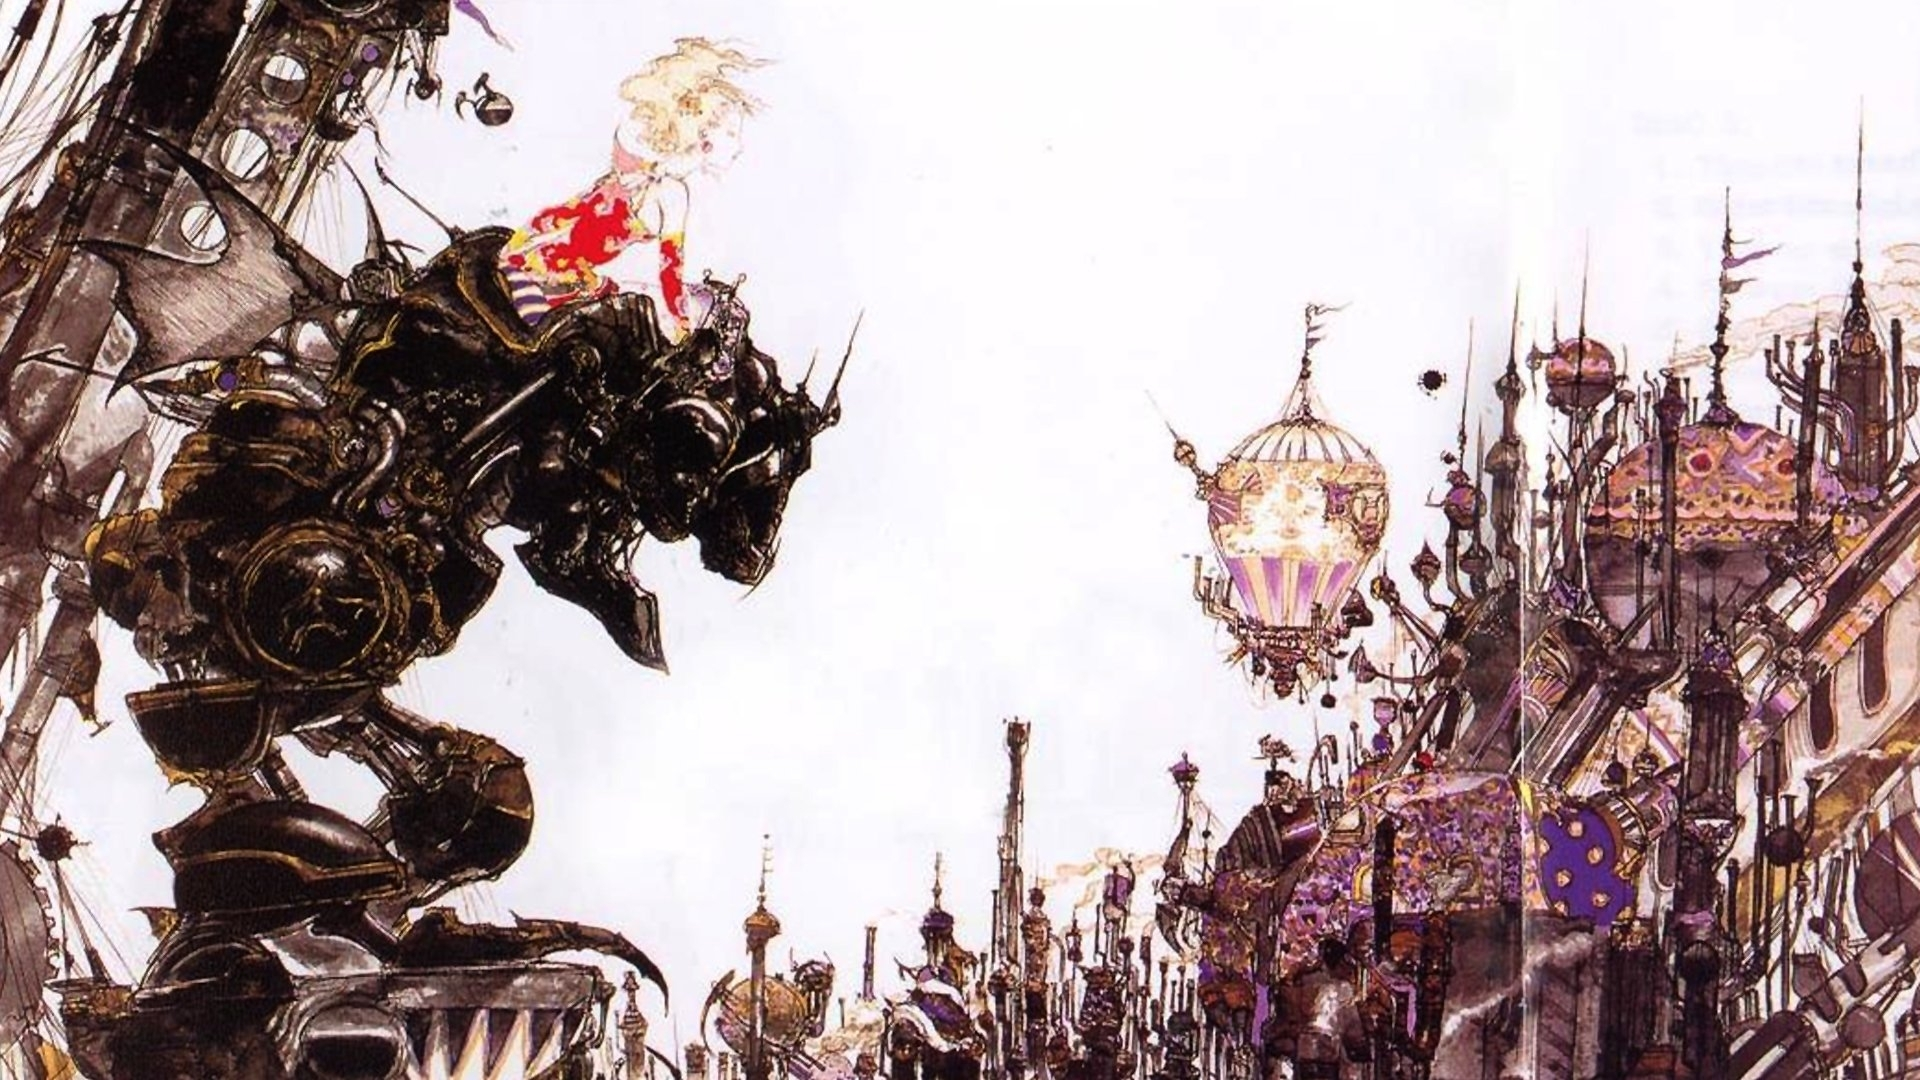 final fantasy vi full hd fond d'écran and arrière-plan | 1920x1080